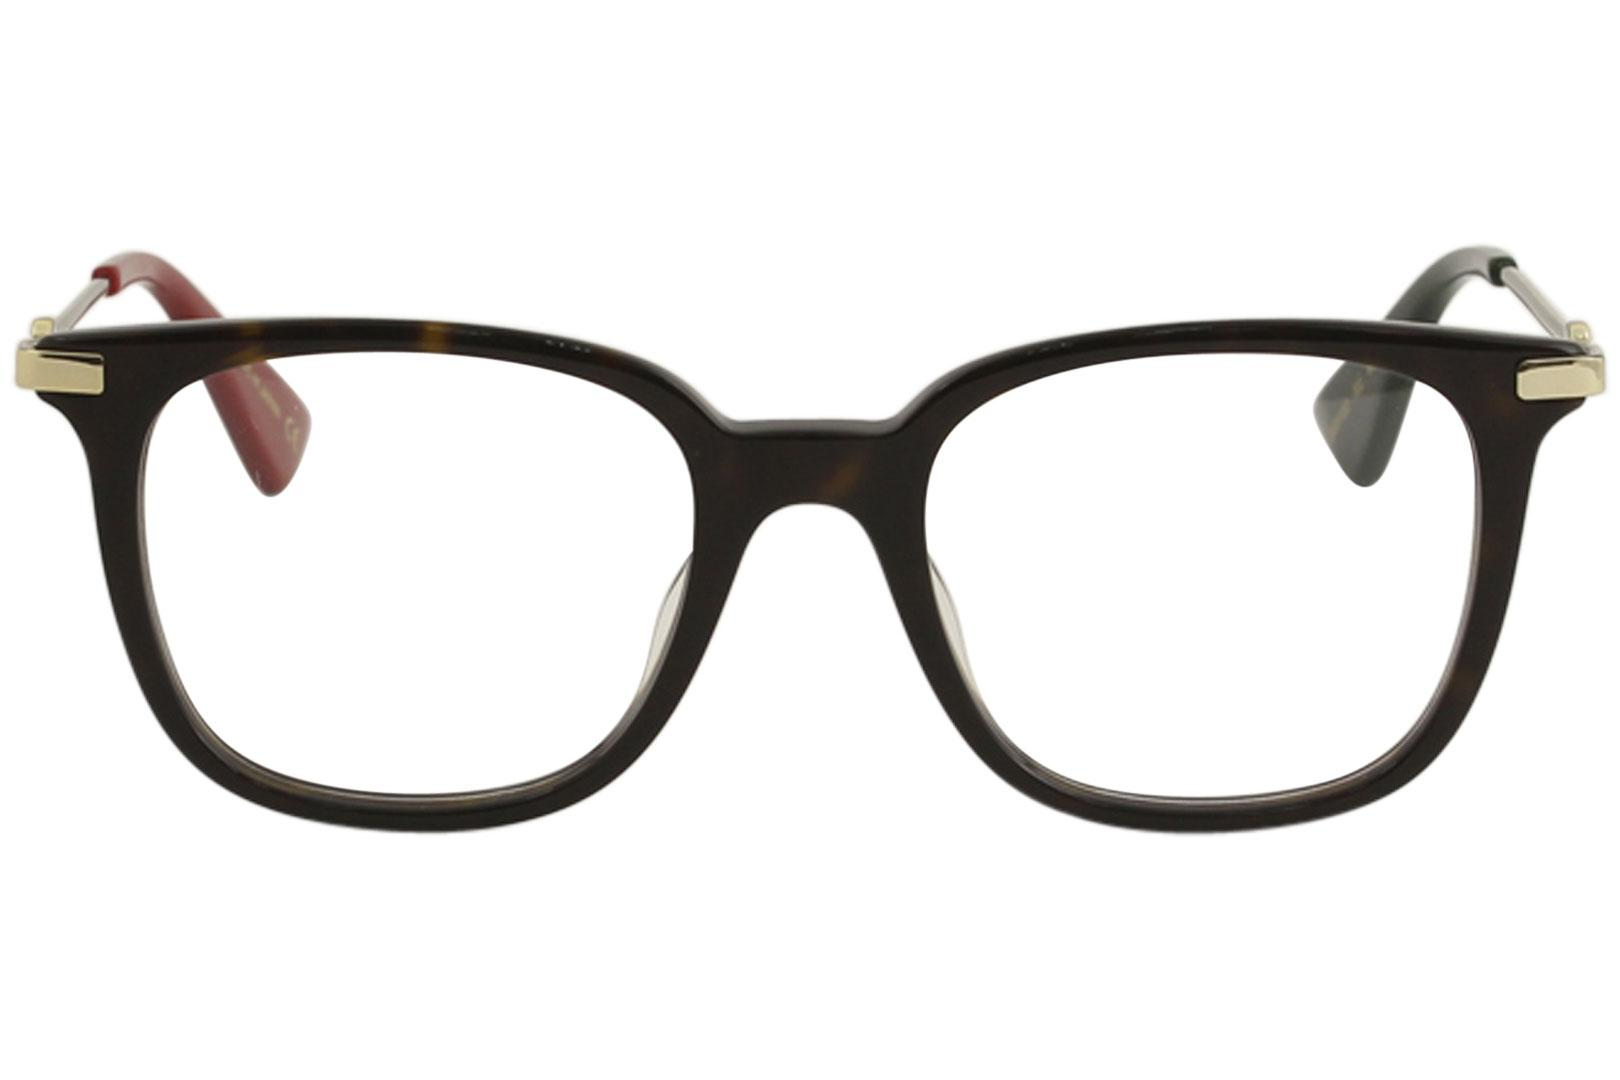 6e24a3b3106 Gucci Women s Eyeglasses GG0110O GG 0110 O Full Rim Optical Frame